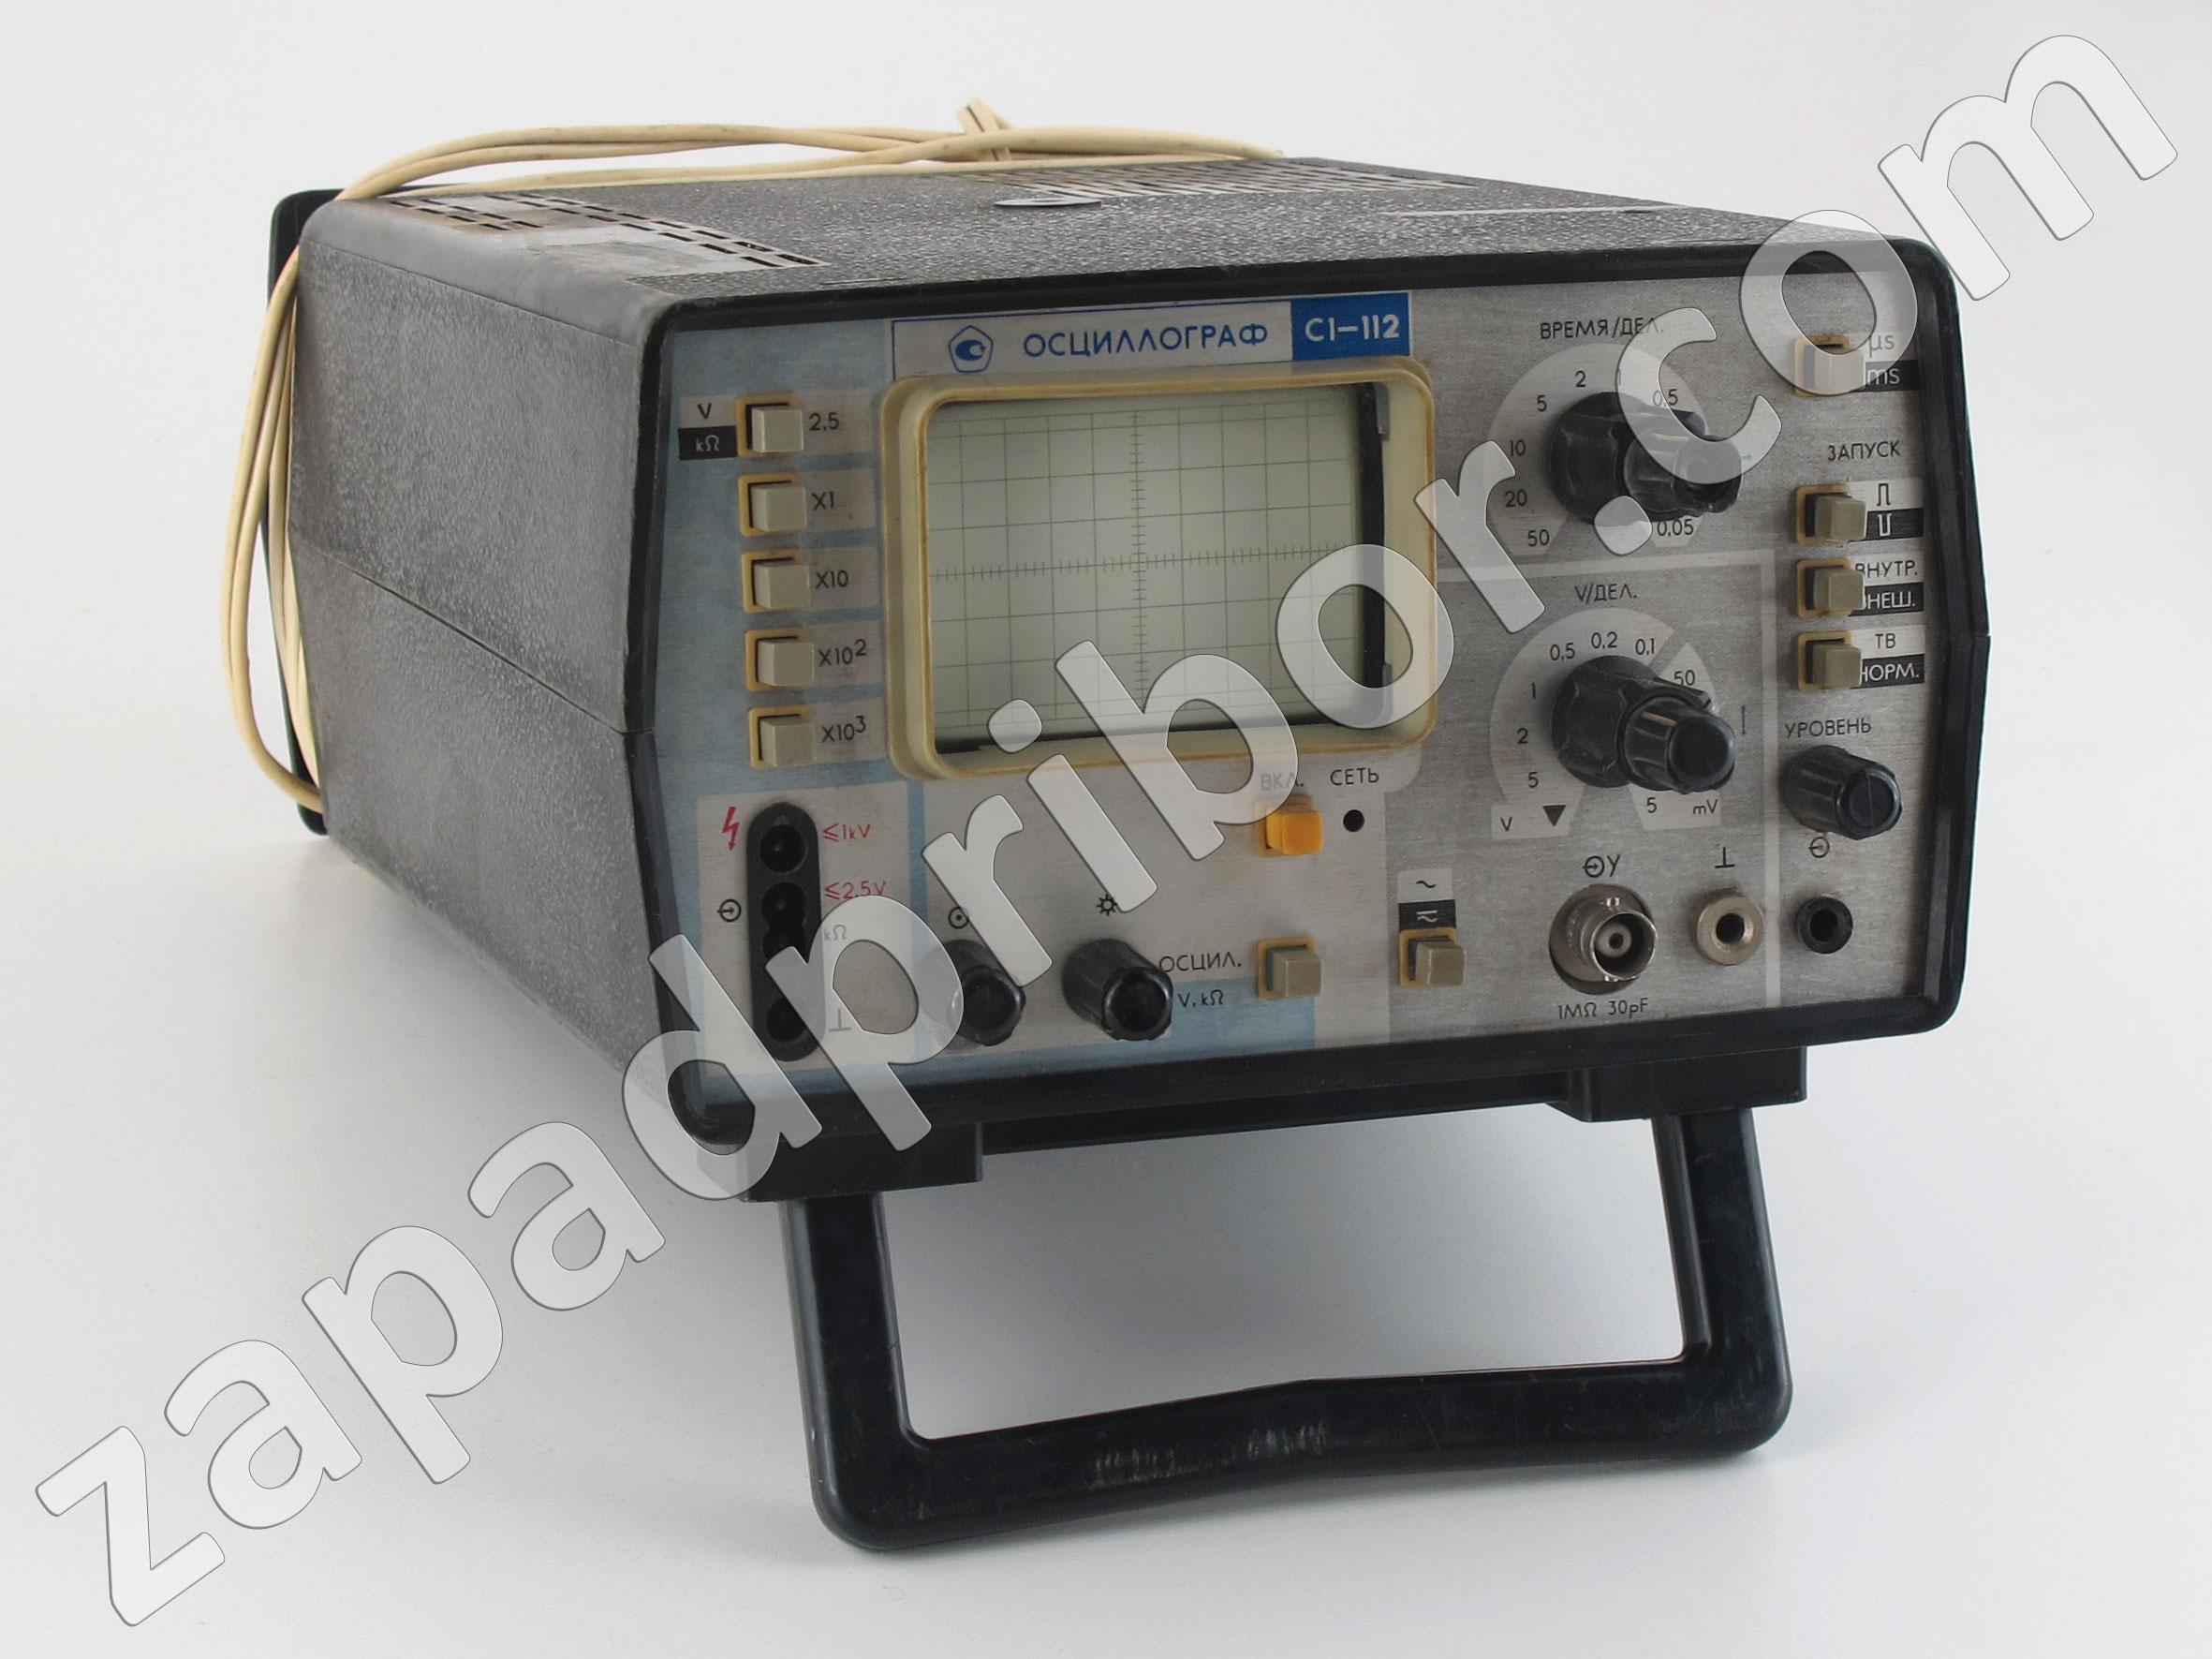 схема пробника для осциллографа с1-74